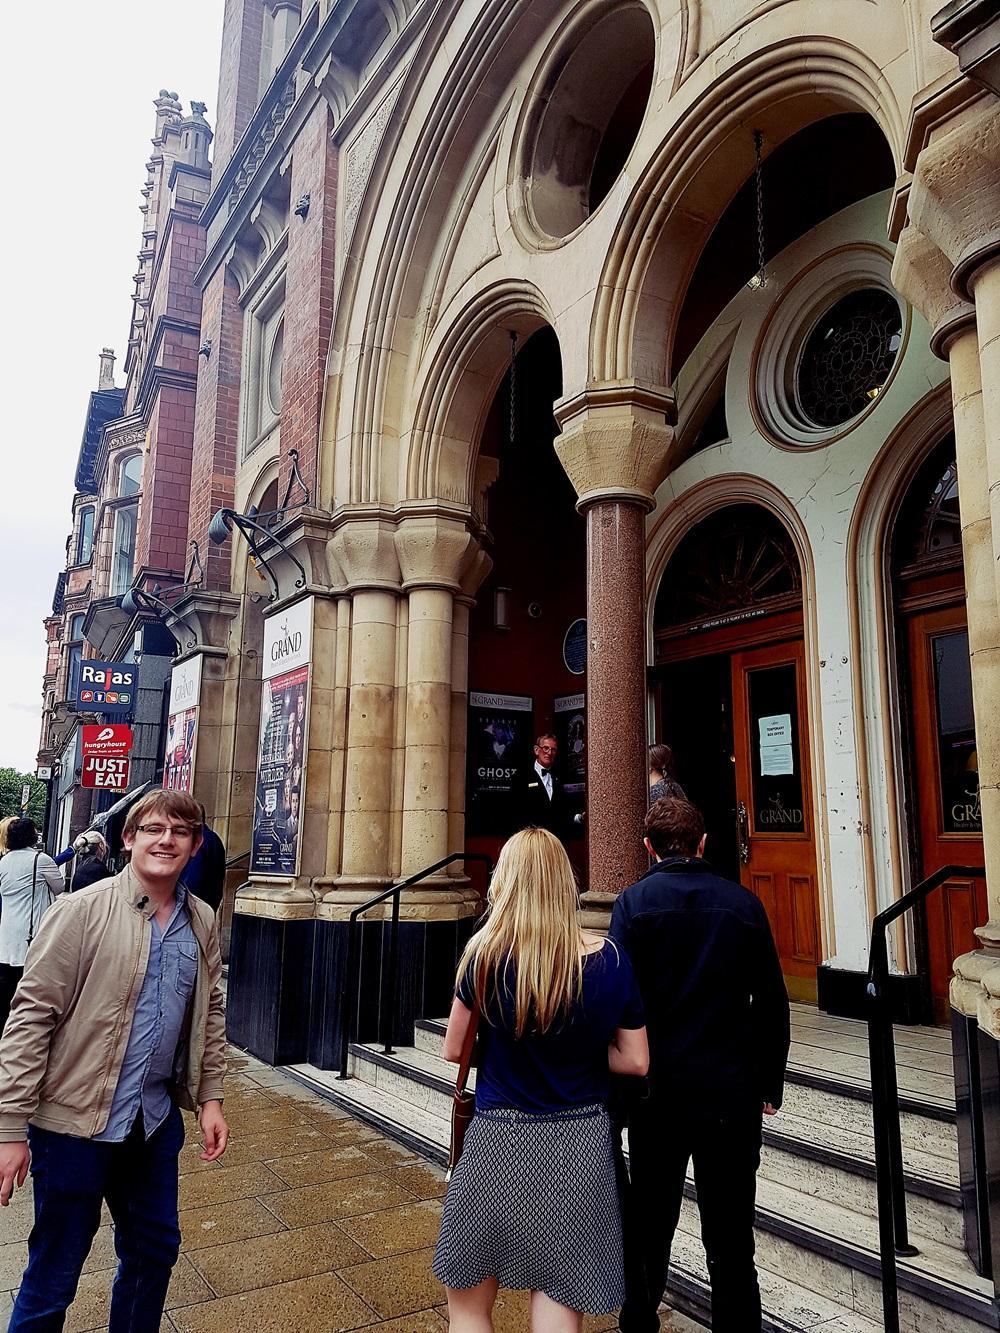 The Grand Theatre Leeds